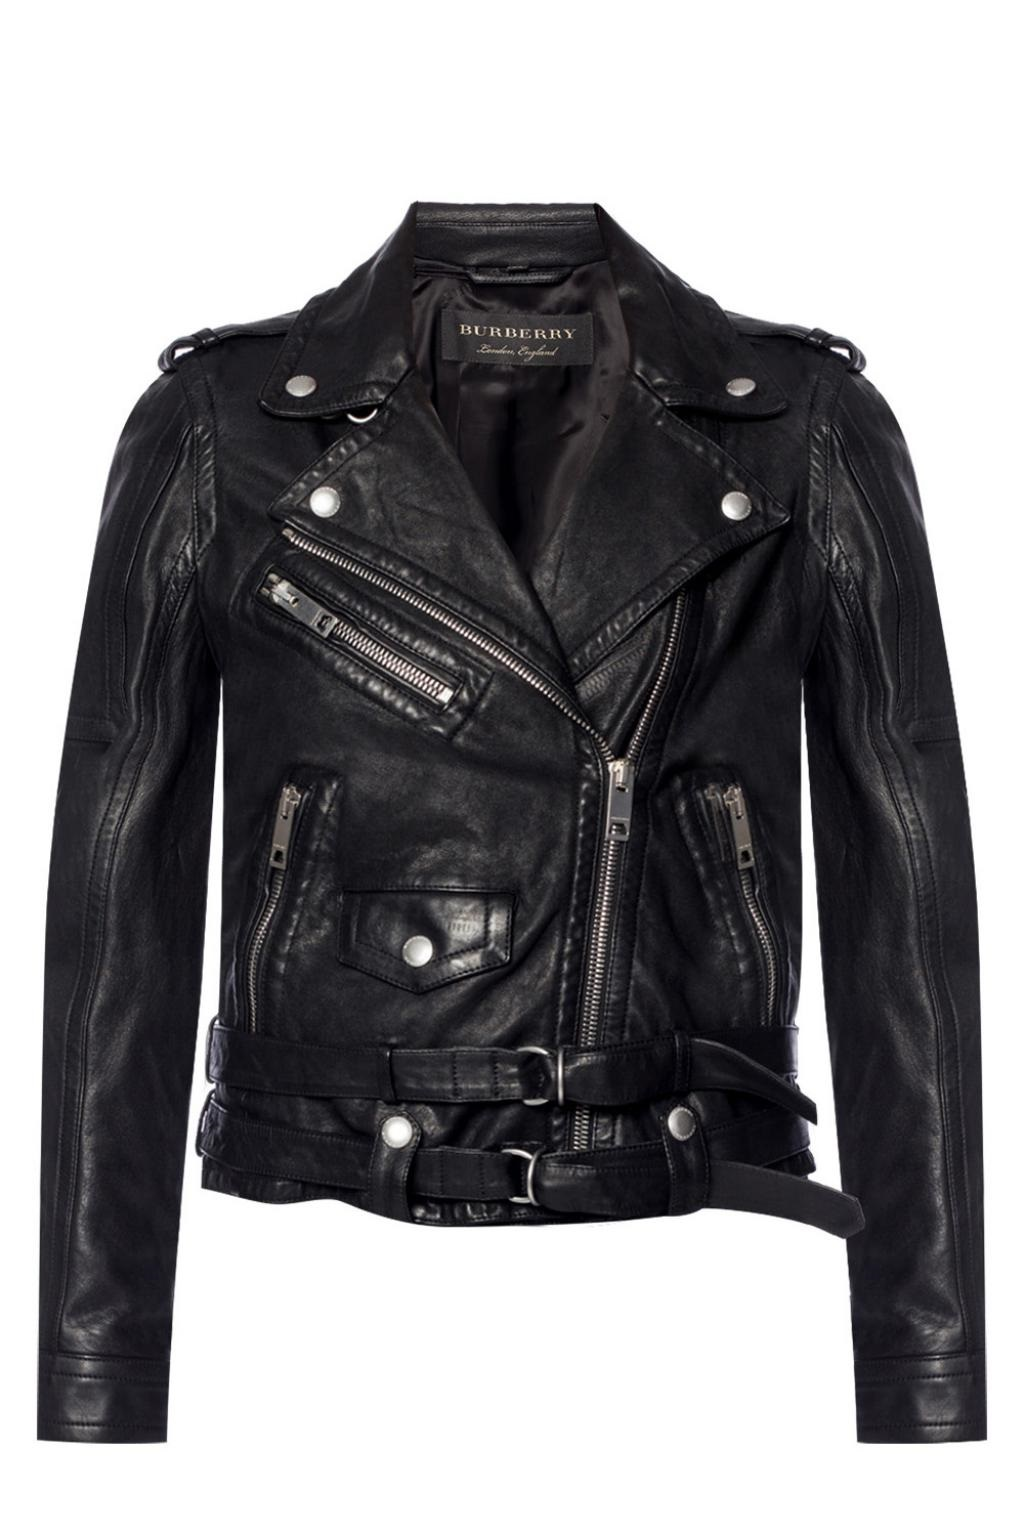 Burberry Reissued Biker Jacket In Black